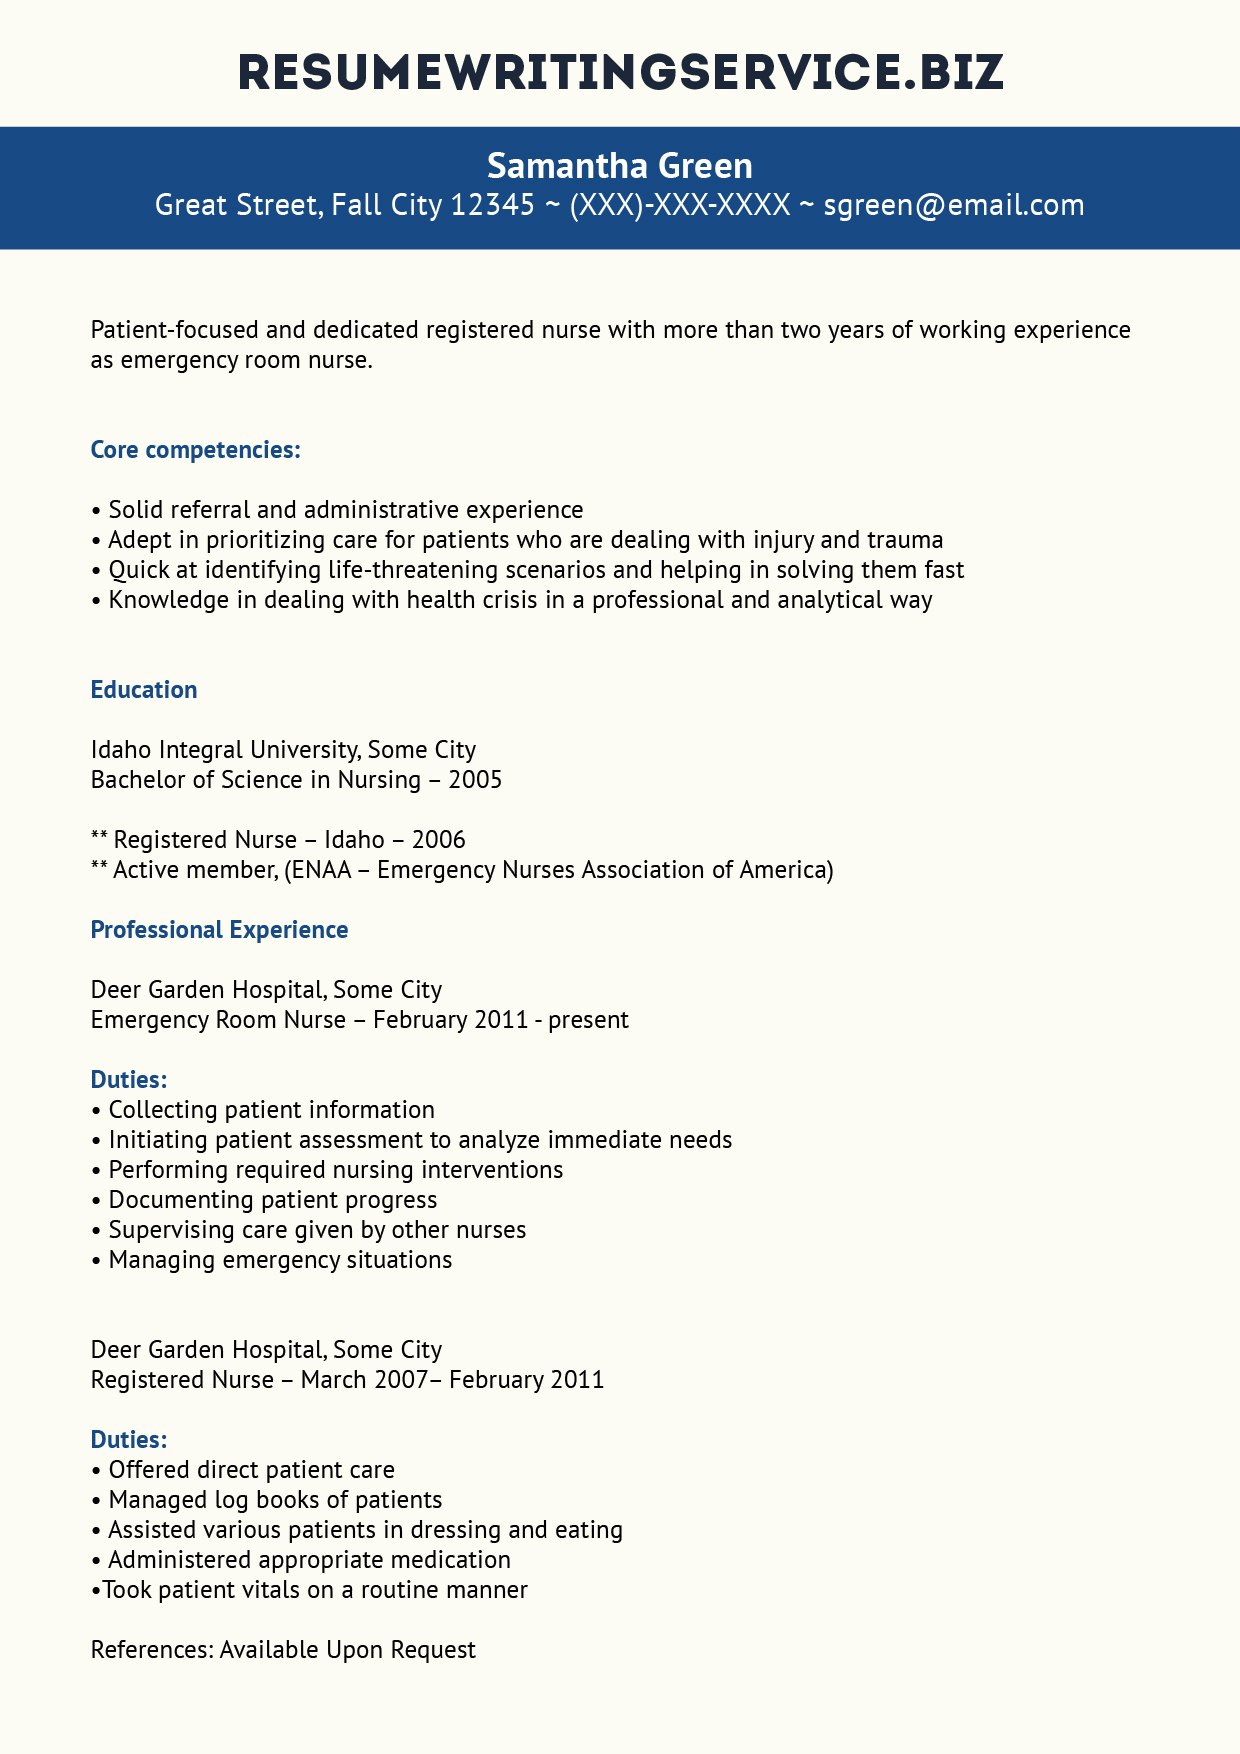 Emergency Nursing Resume Examples Inspiring Photos Professional Er Nurse Resume Example